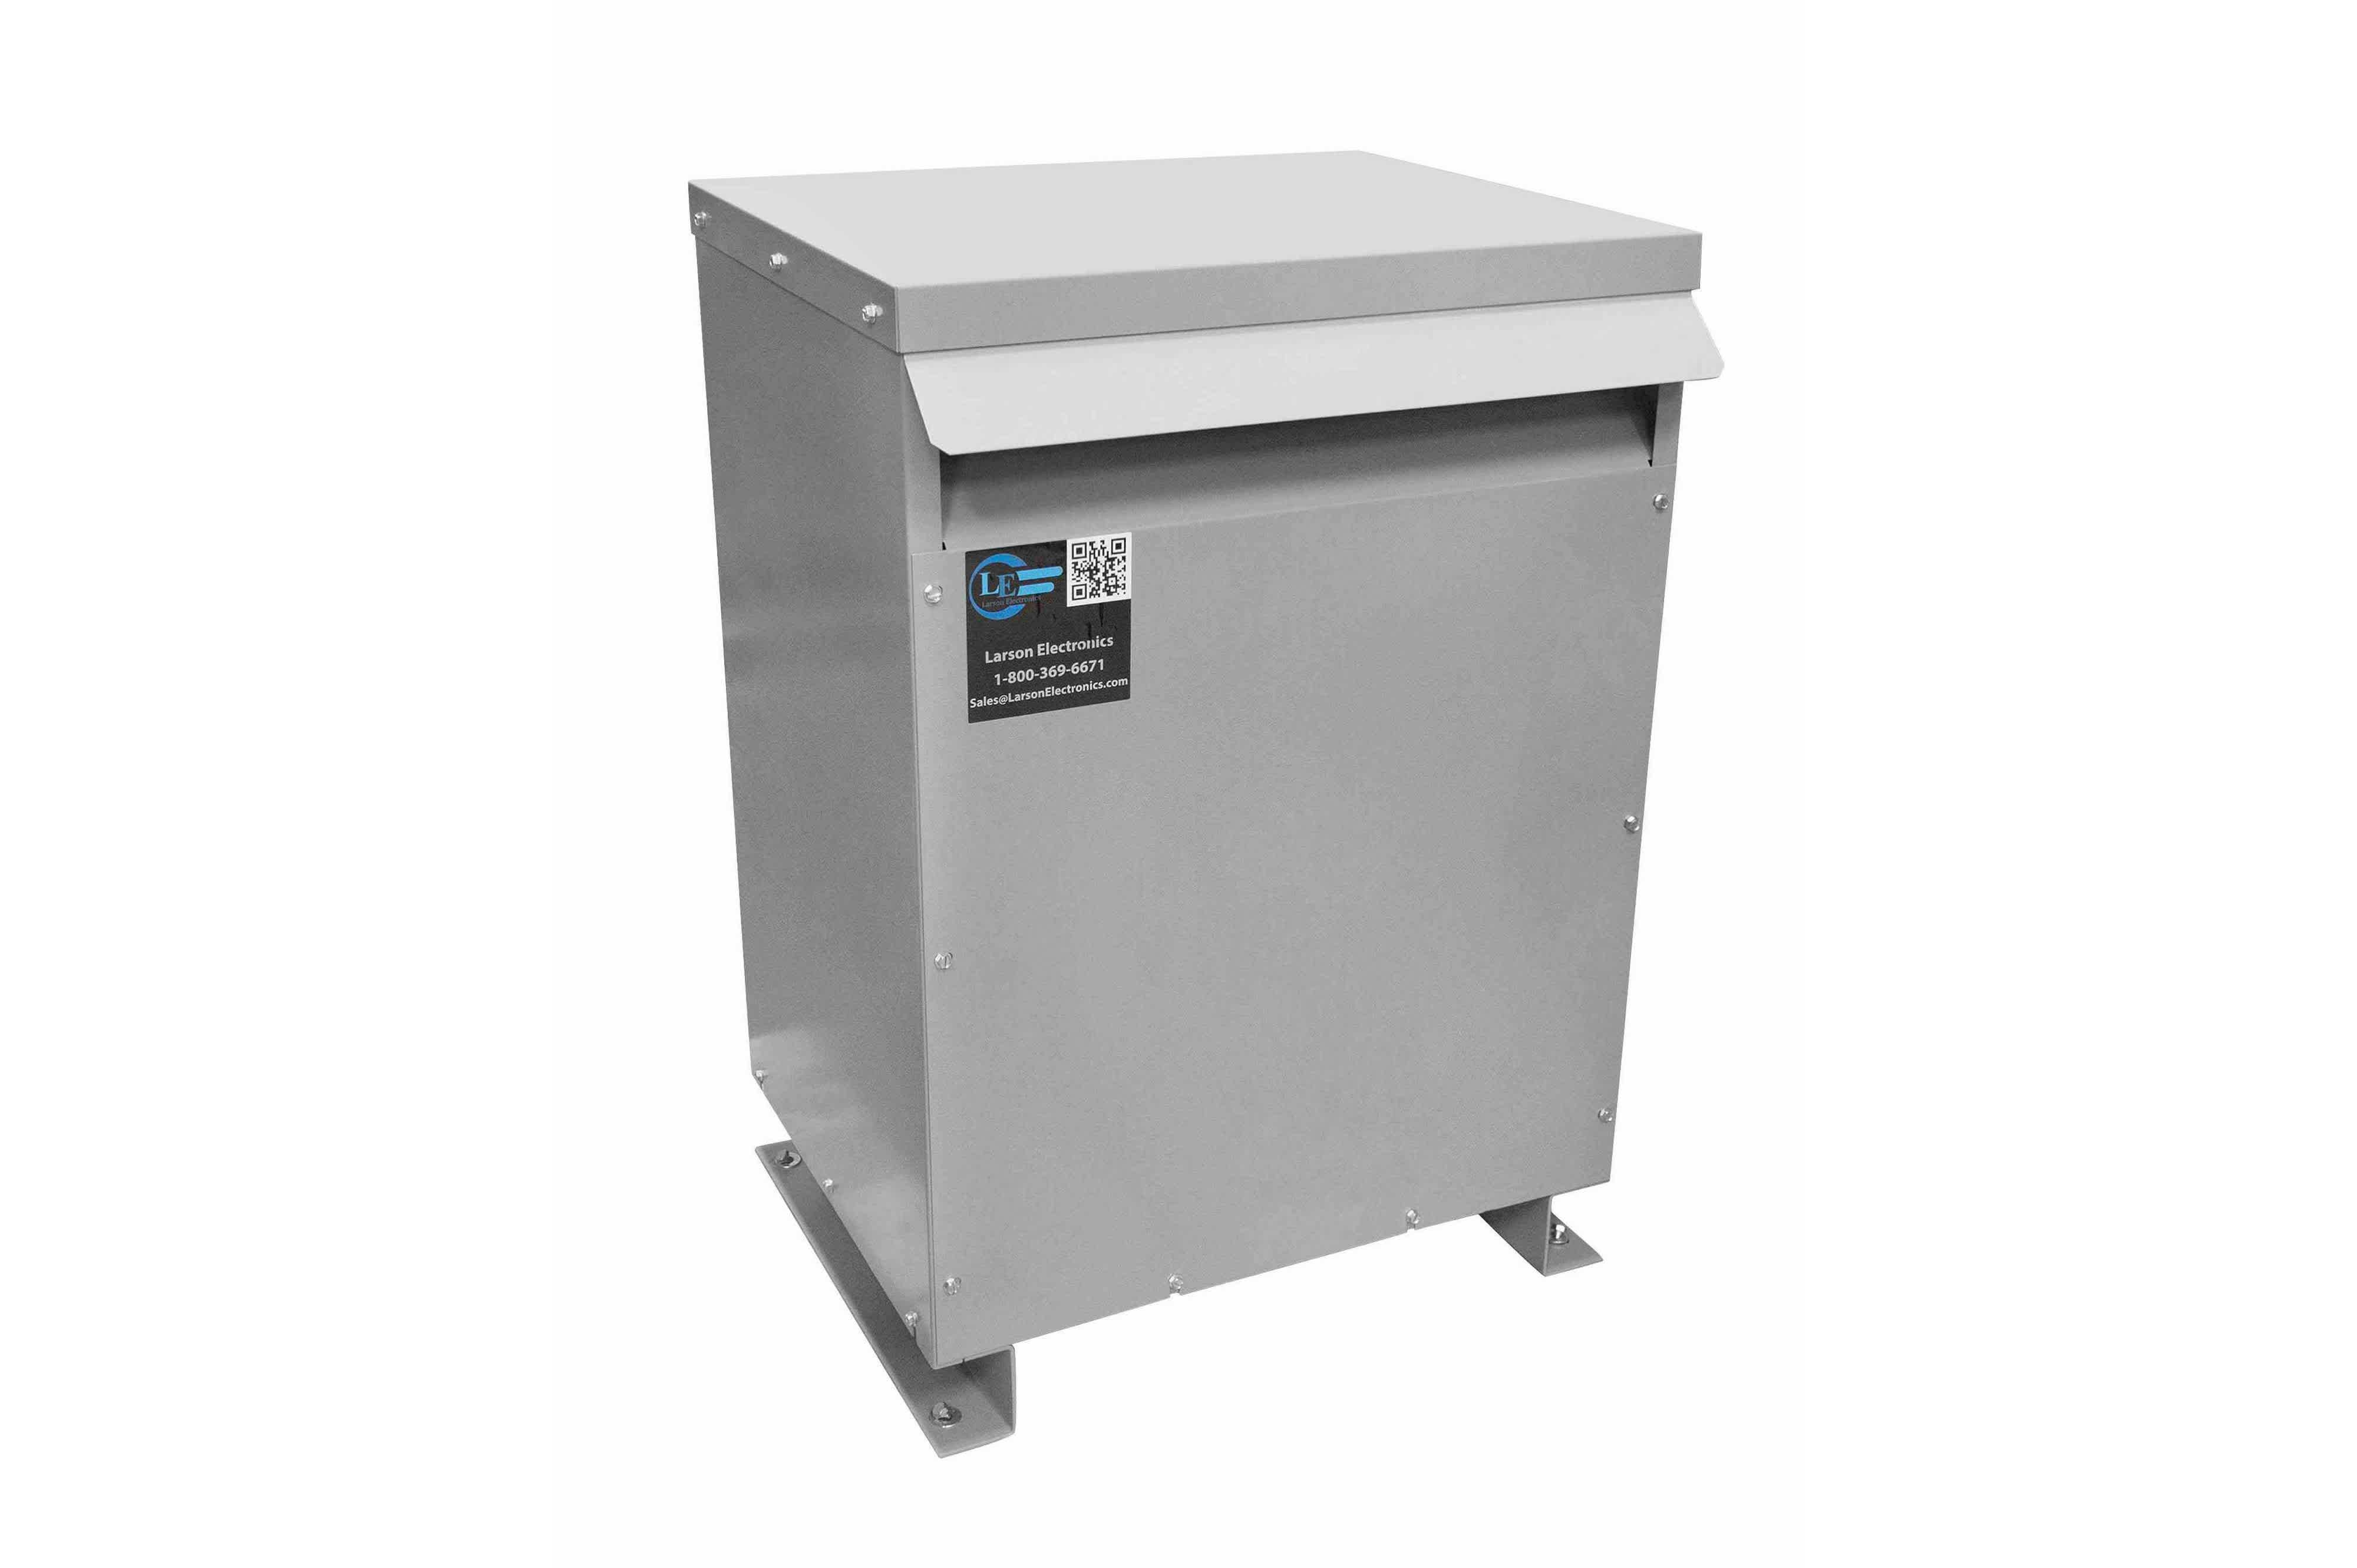 40 kVA 3PH Isolation Transformer, 400V Wye Primary, 240V/120 Delta Secondary, N3R, Ventilated, 60 Hz